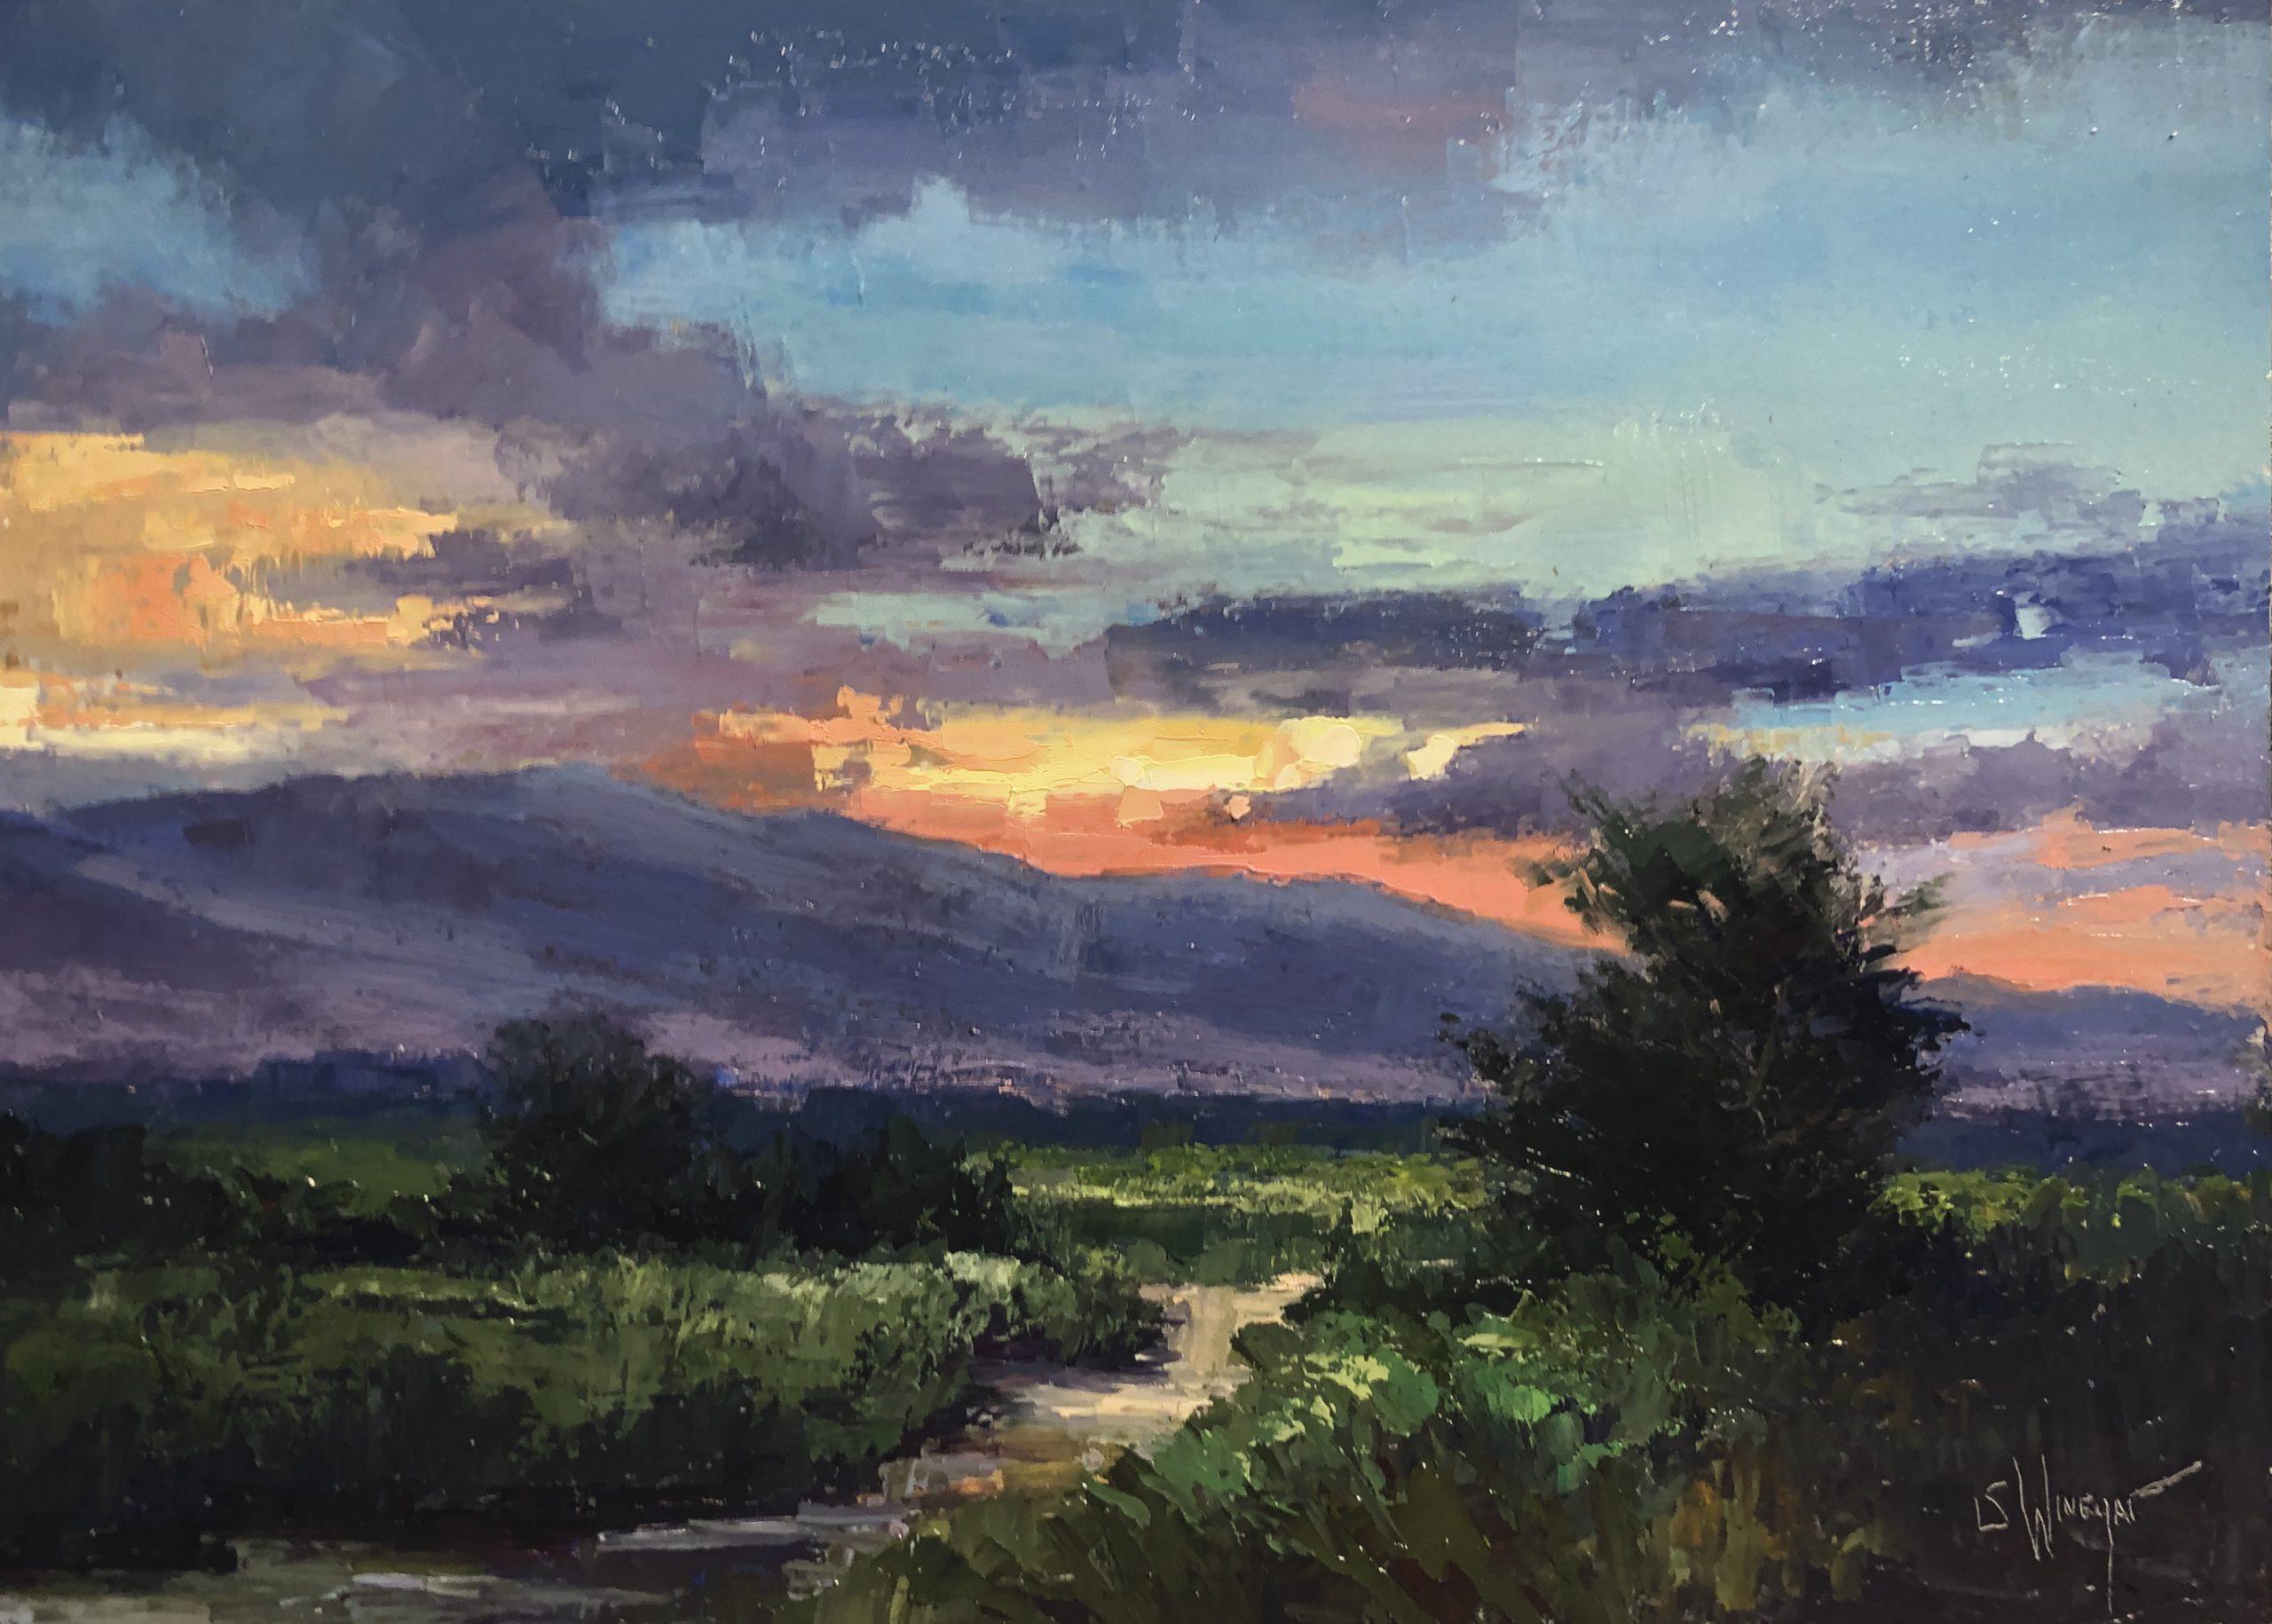 Simon Winegar - Wasatch Sunrise